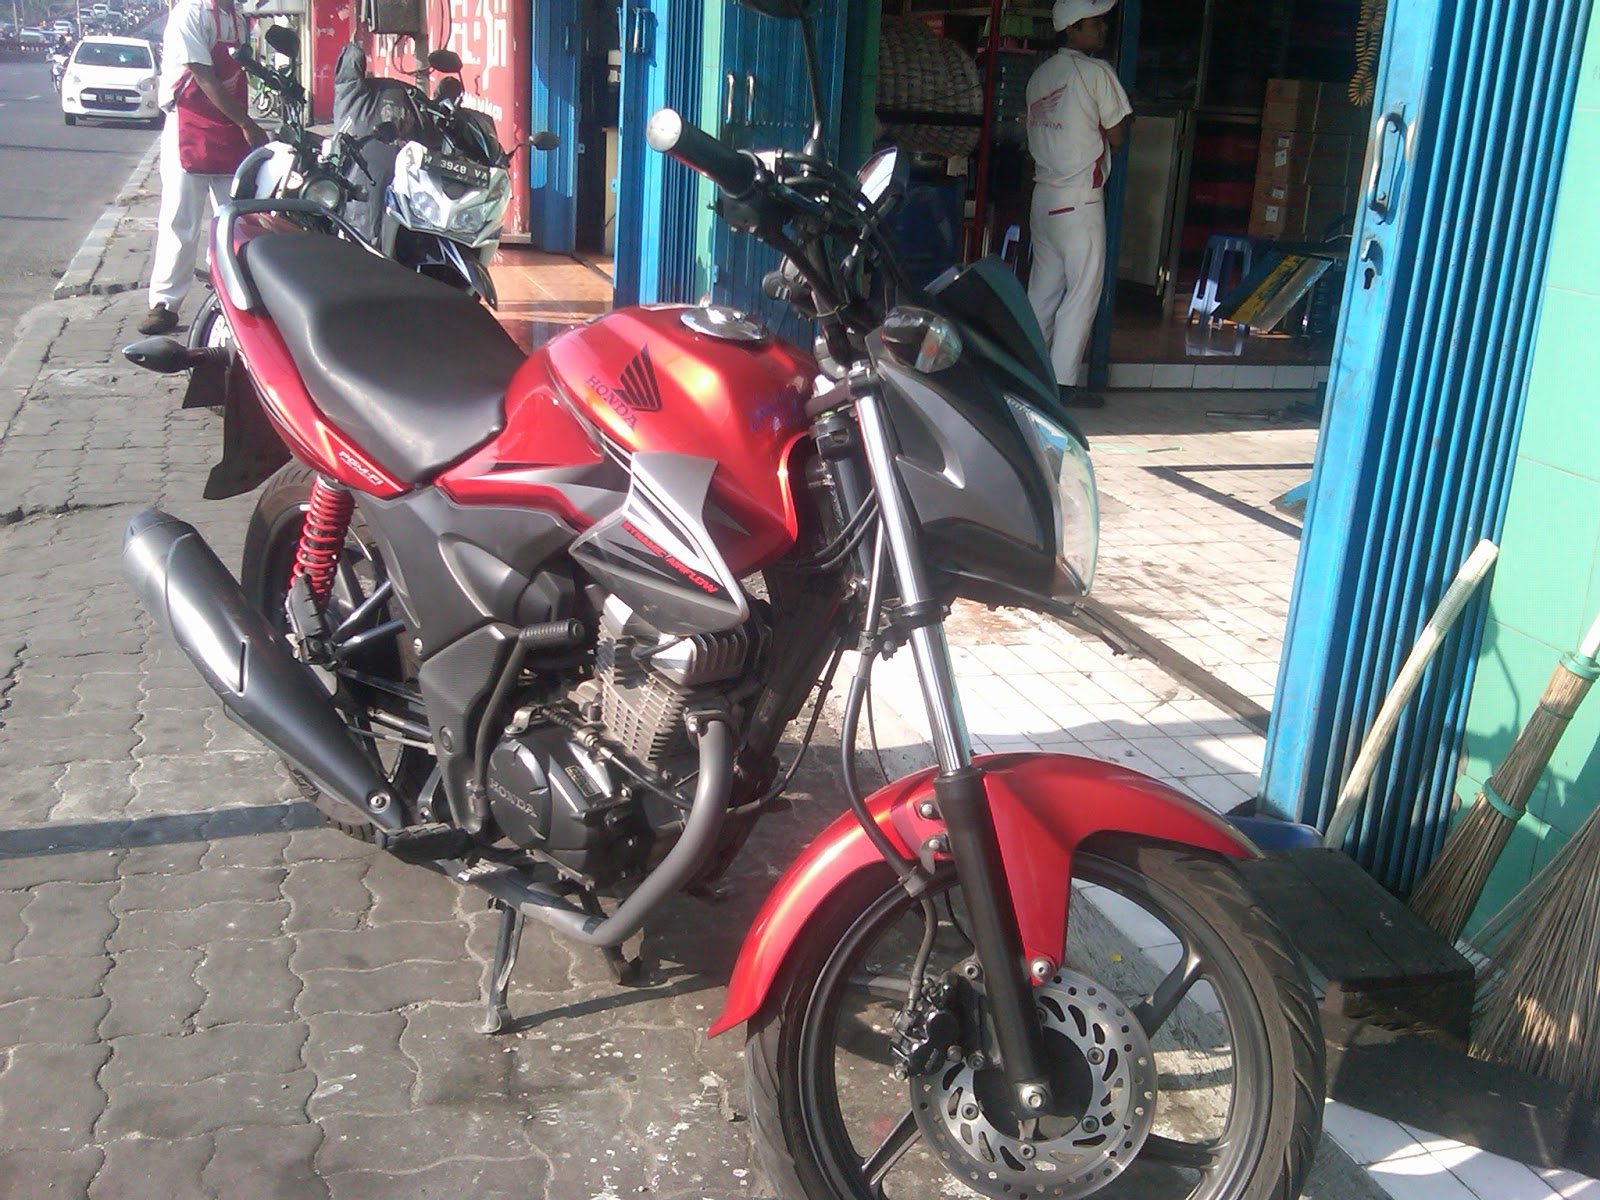 Bangjoru Komstir Motor Honda Bisa Saling Substitusi Racing Bambu Supra X 125 Fit New Vario 150 Cs1 Blade Revo Beat Scoopy Spacy